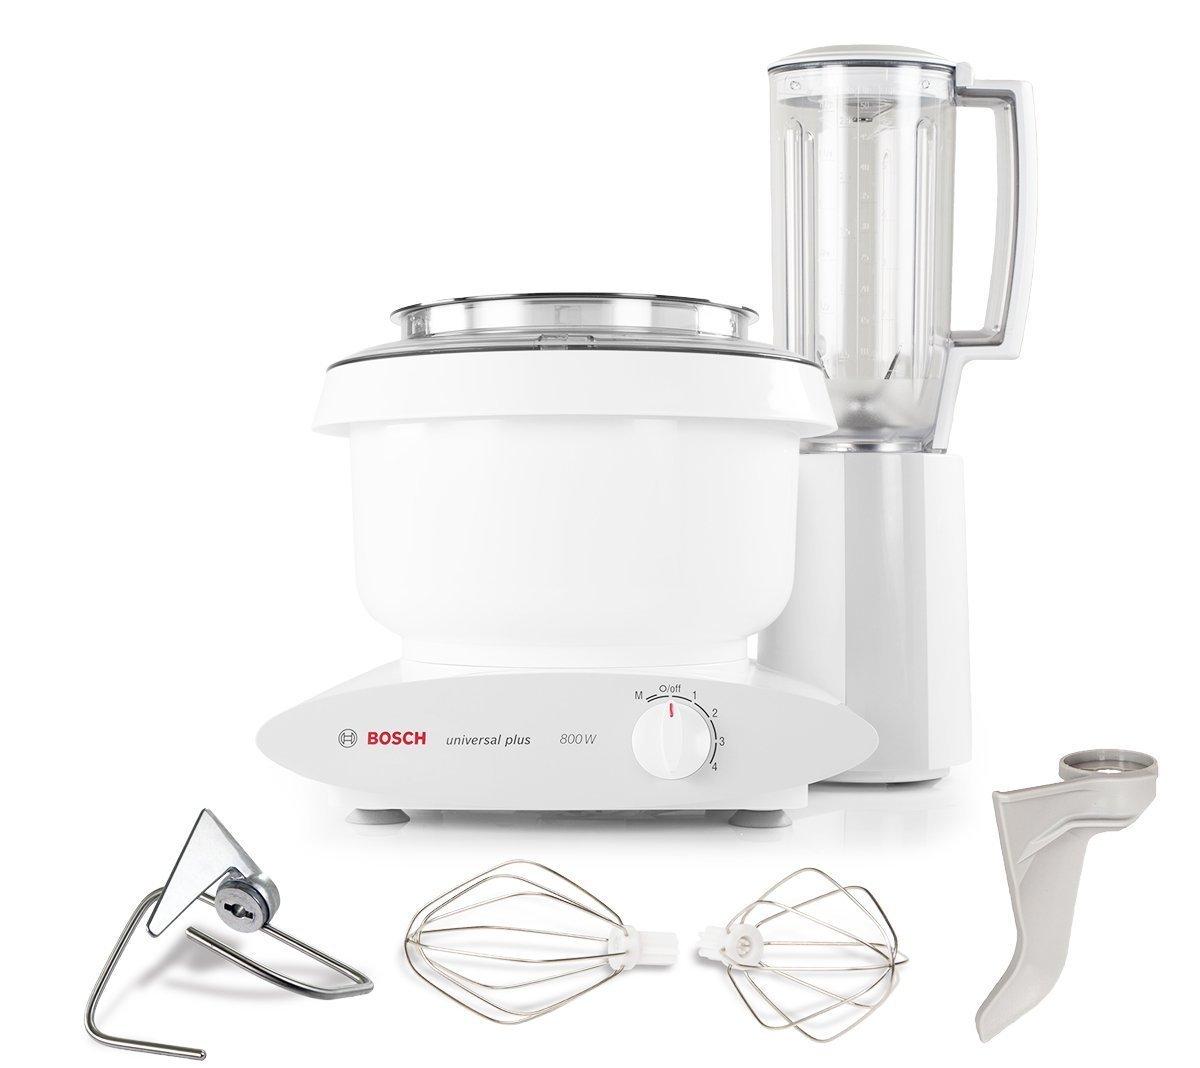 Bosch MUM6N11UC Universal Plus Stand Mixer, 800 Watt, 6.5-Quarts with 6 Cup Blender